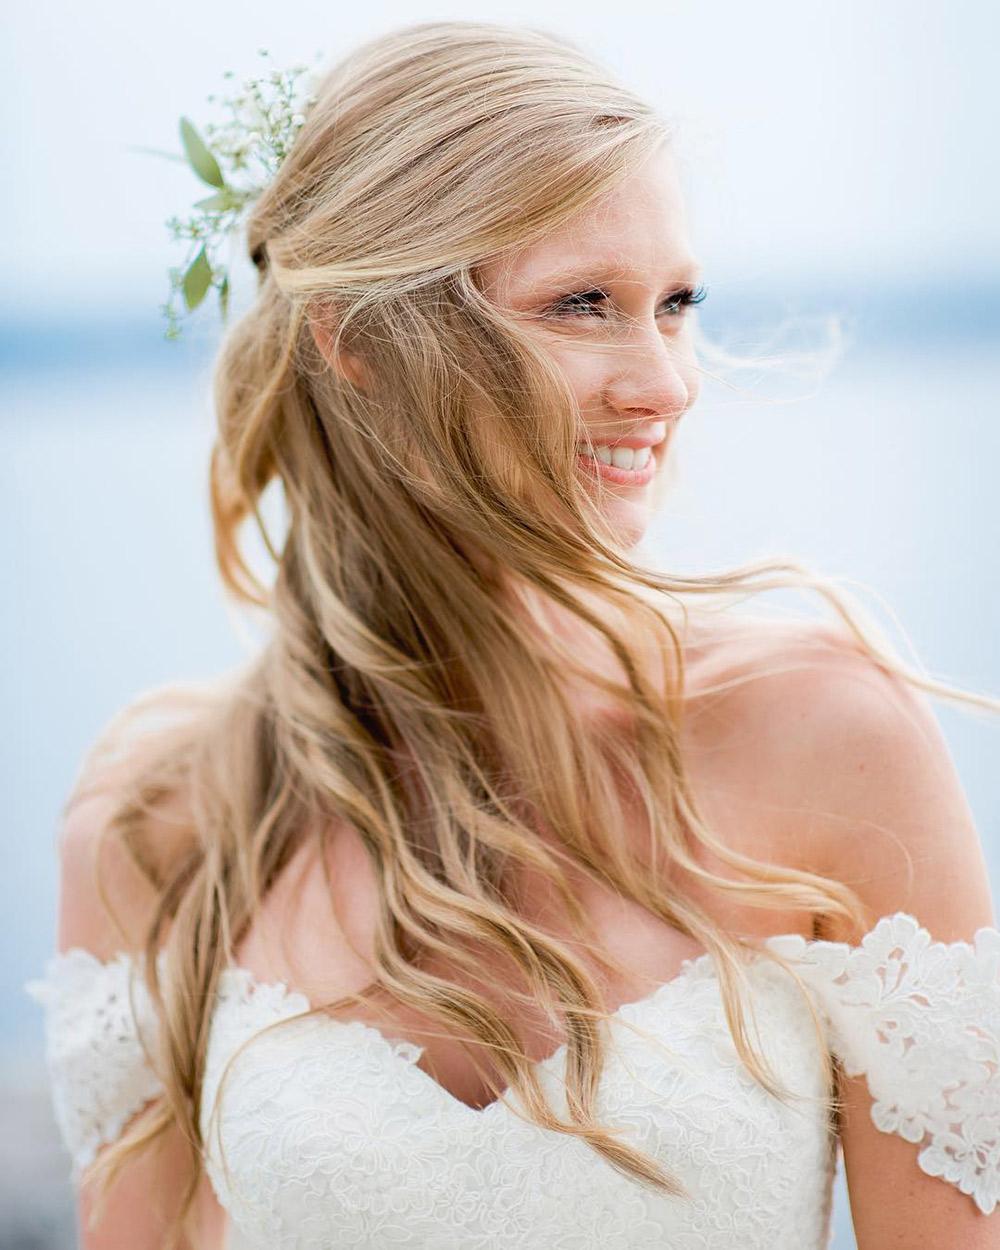 Simply-Stunning-Bridal-Makeup-Vineyard-Bride-002.jpg